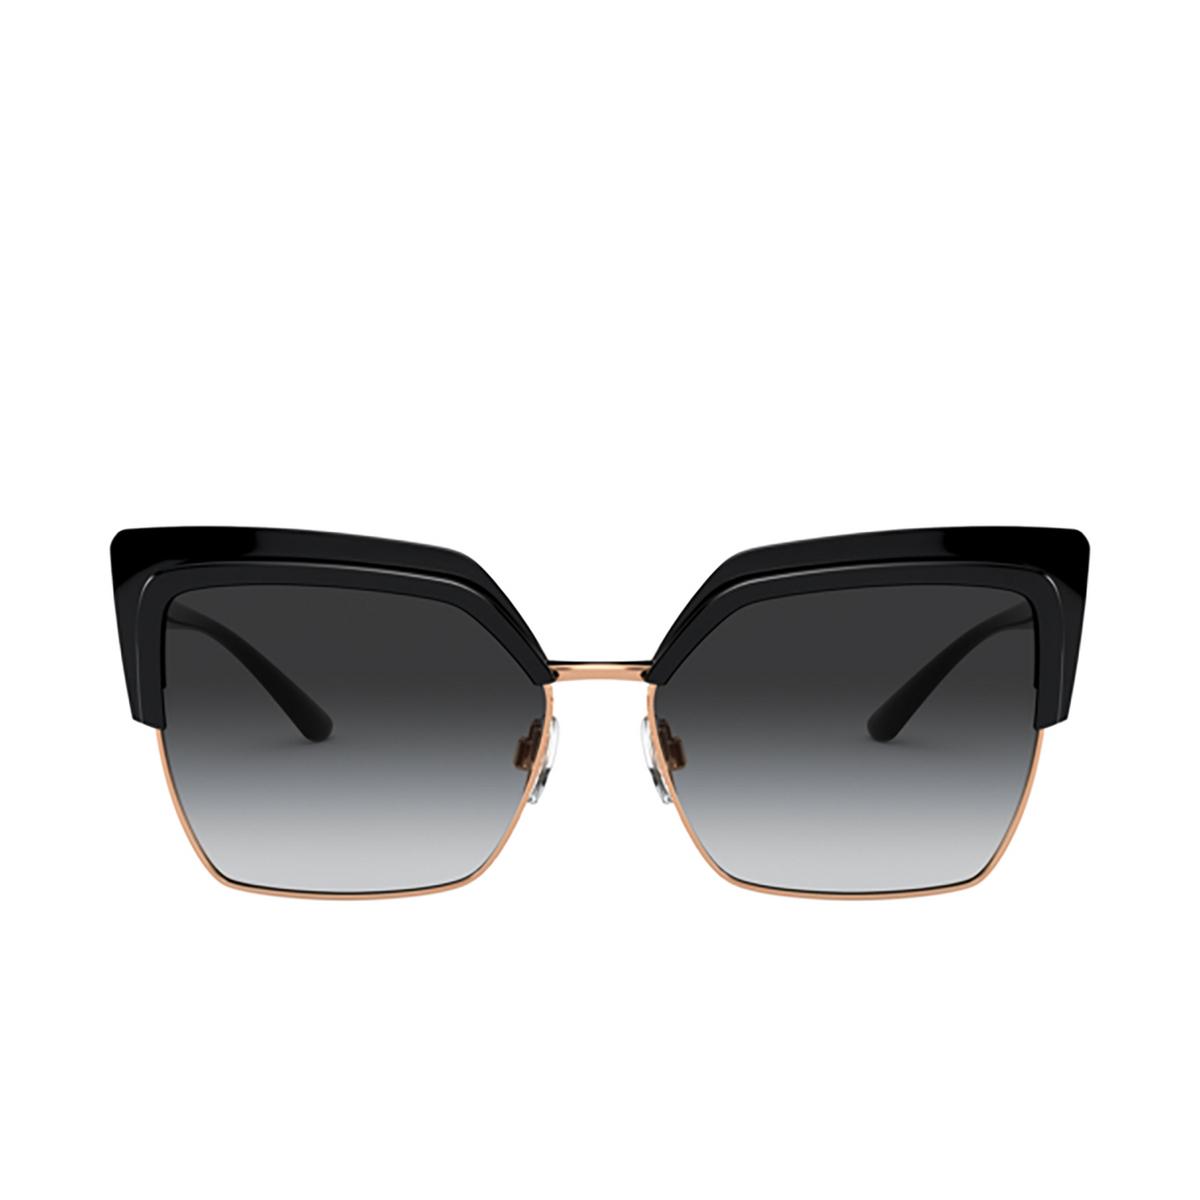 Dolce & Gabbana® Butterfly Sunglasses: DG6126 color Black 501/8G - 1/3.